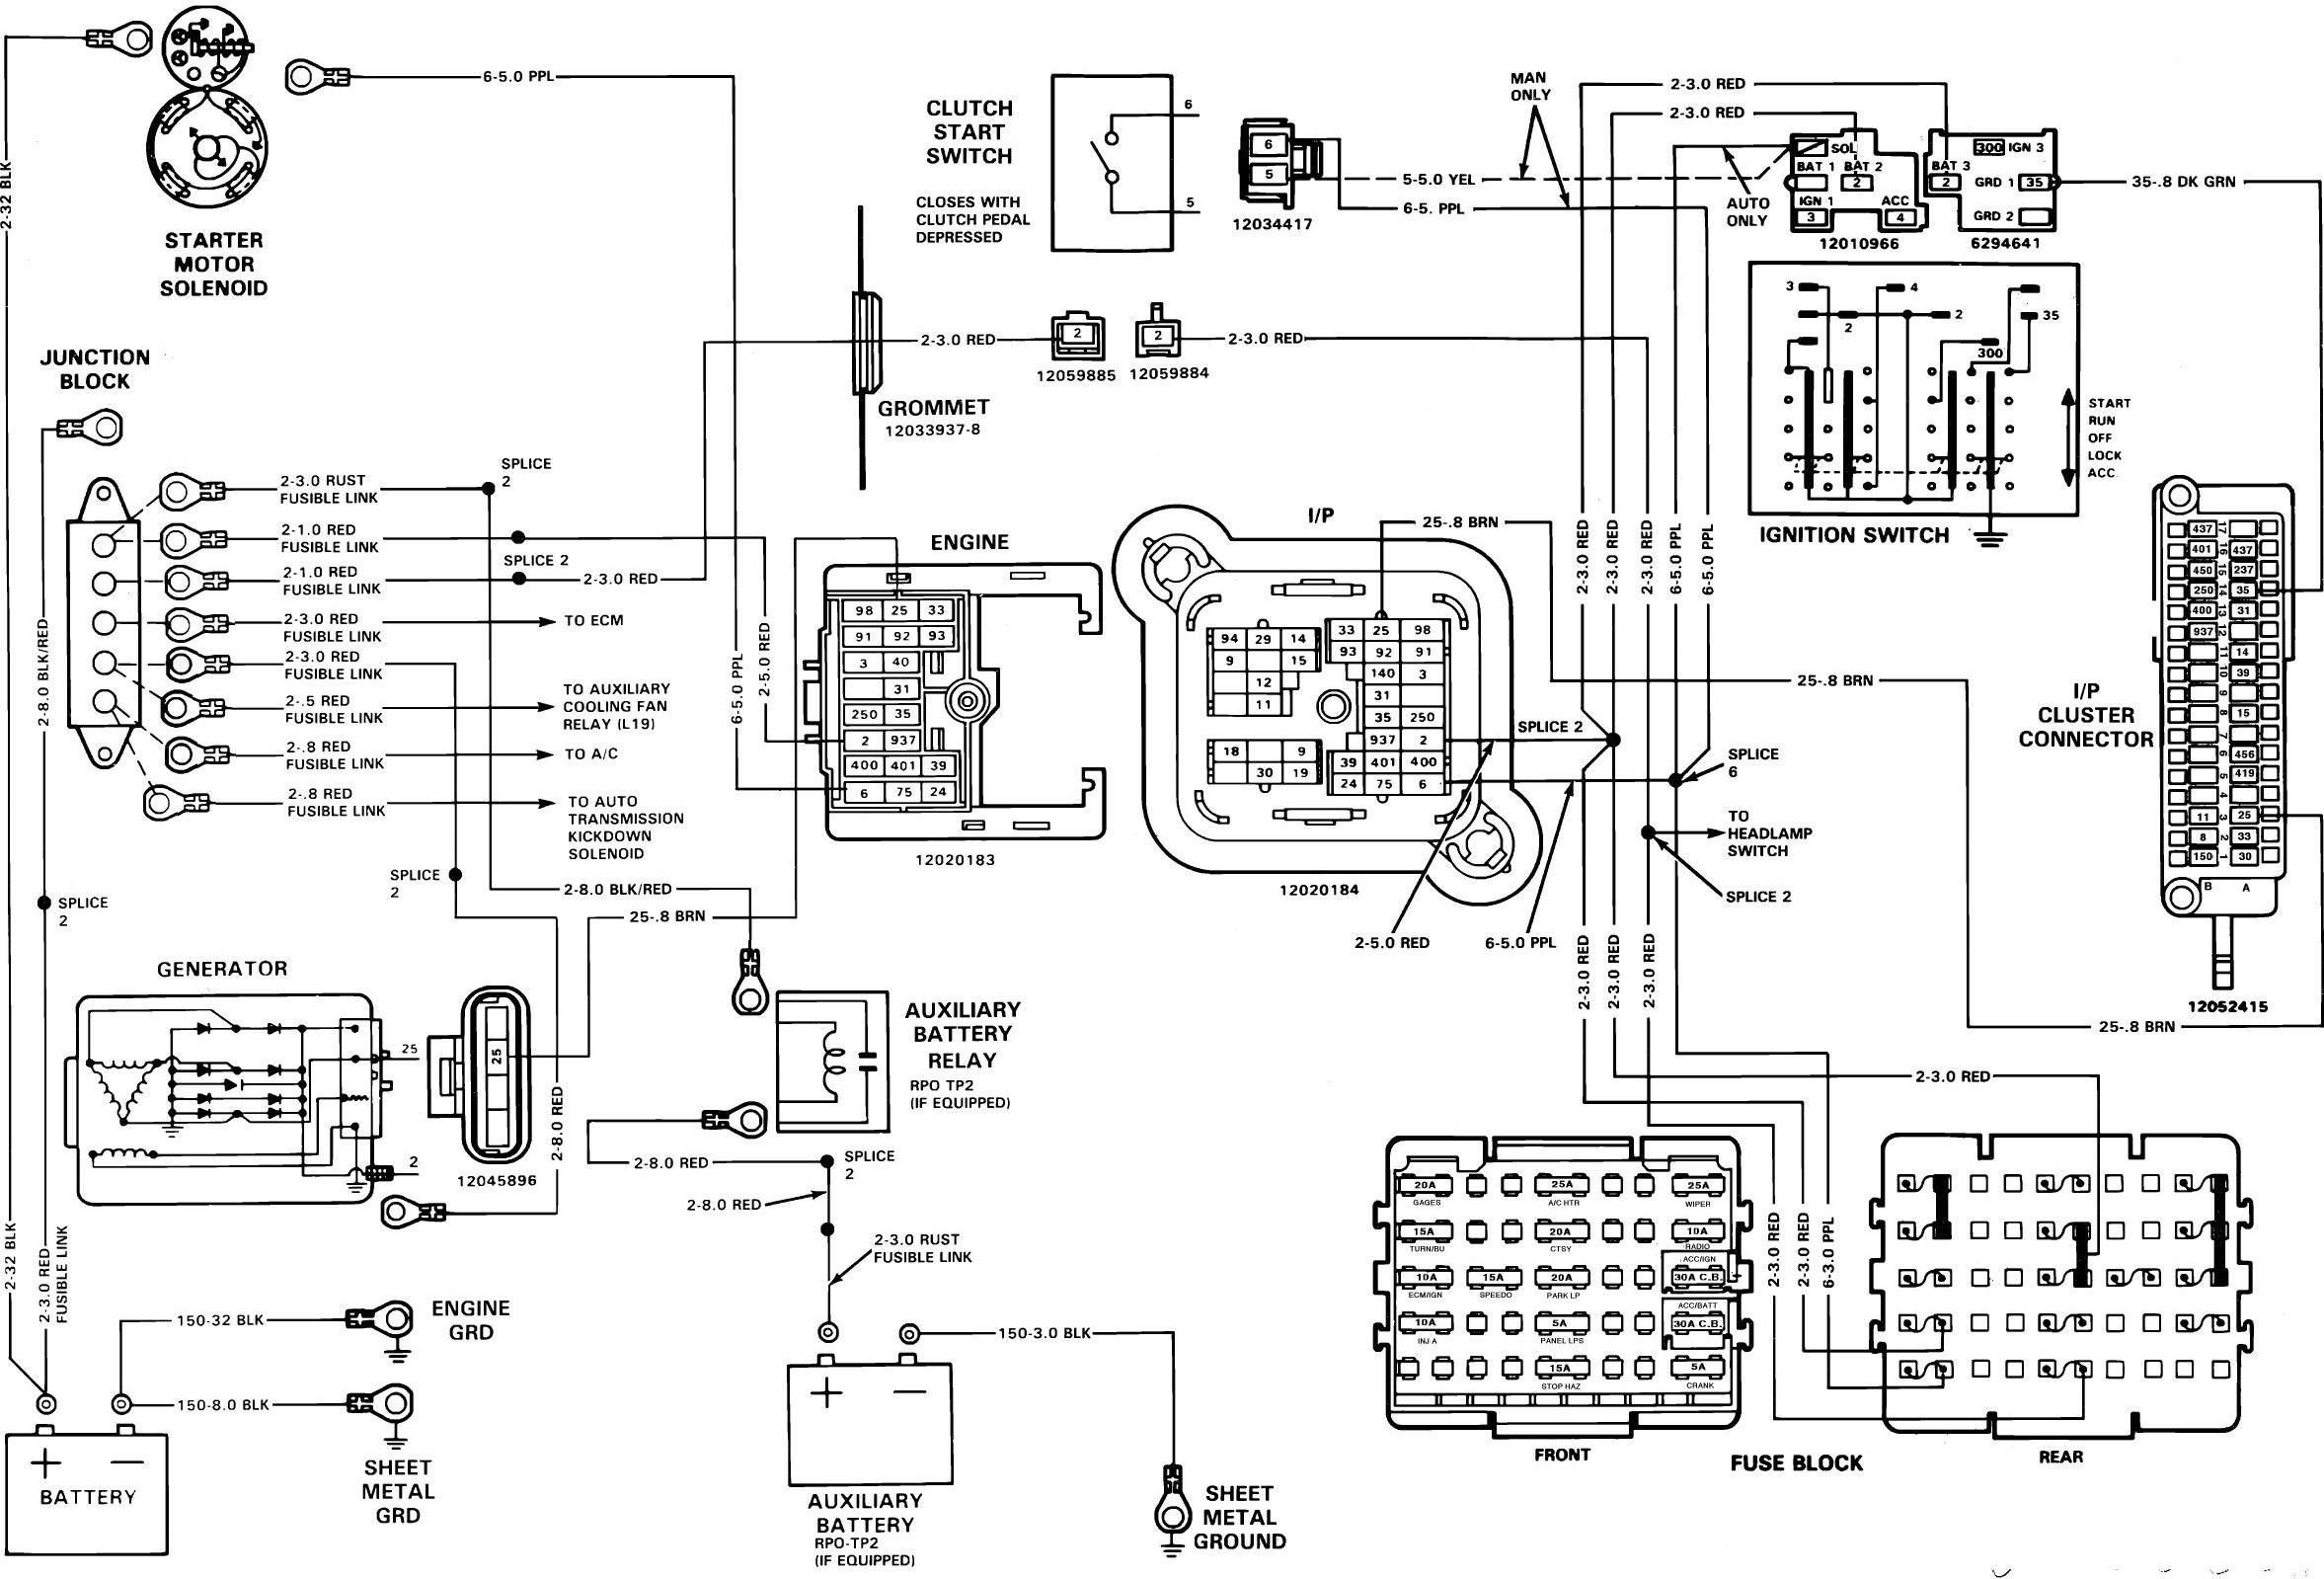 [SCHEMATICS_4NL]  A3EC 1989 Chevy Tbi 350 Engine Wiring Diagram | Wiring Library | 1989 Chevrolet Silverado Wiring Diagram |  | Wiring Library